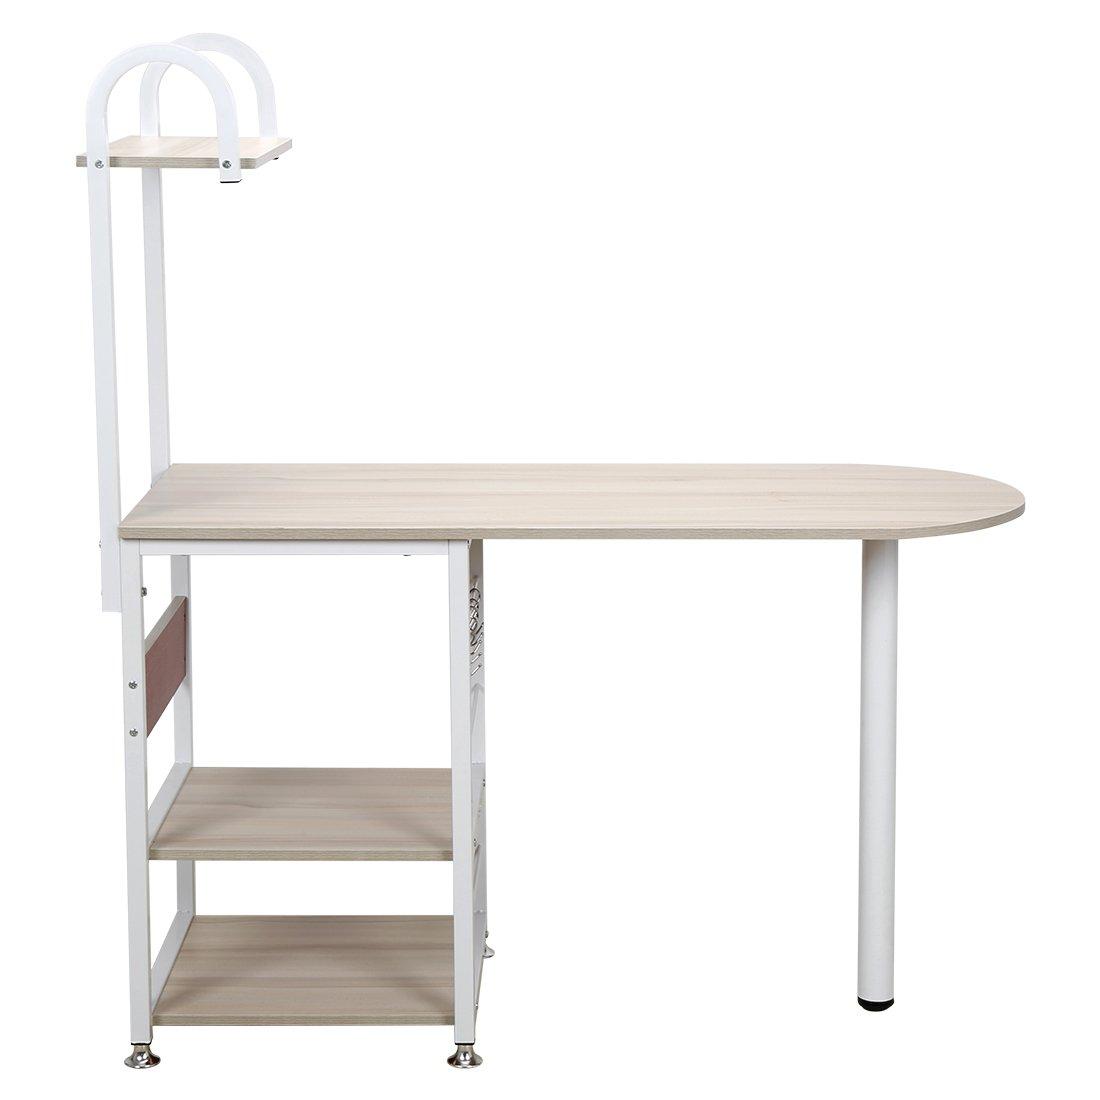 4 Tier Multipurpose Storage Shelf Bakers Rack, Metal Frame and Wooden Worktop for Kitchen by BestValue GO (Image #7)